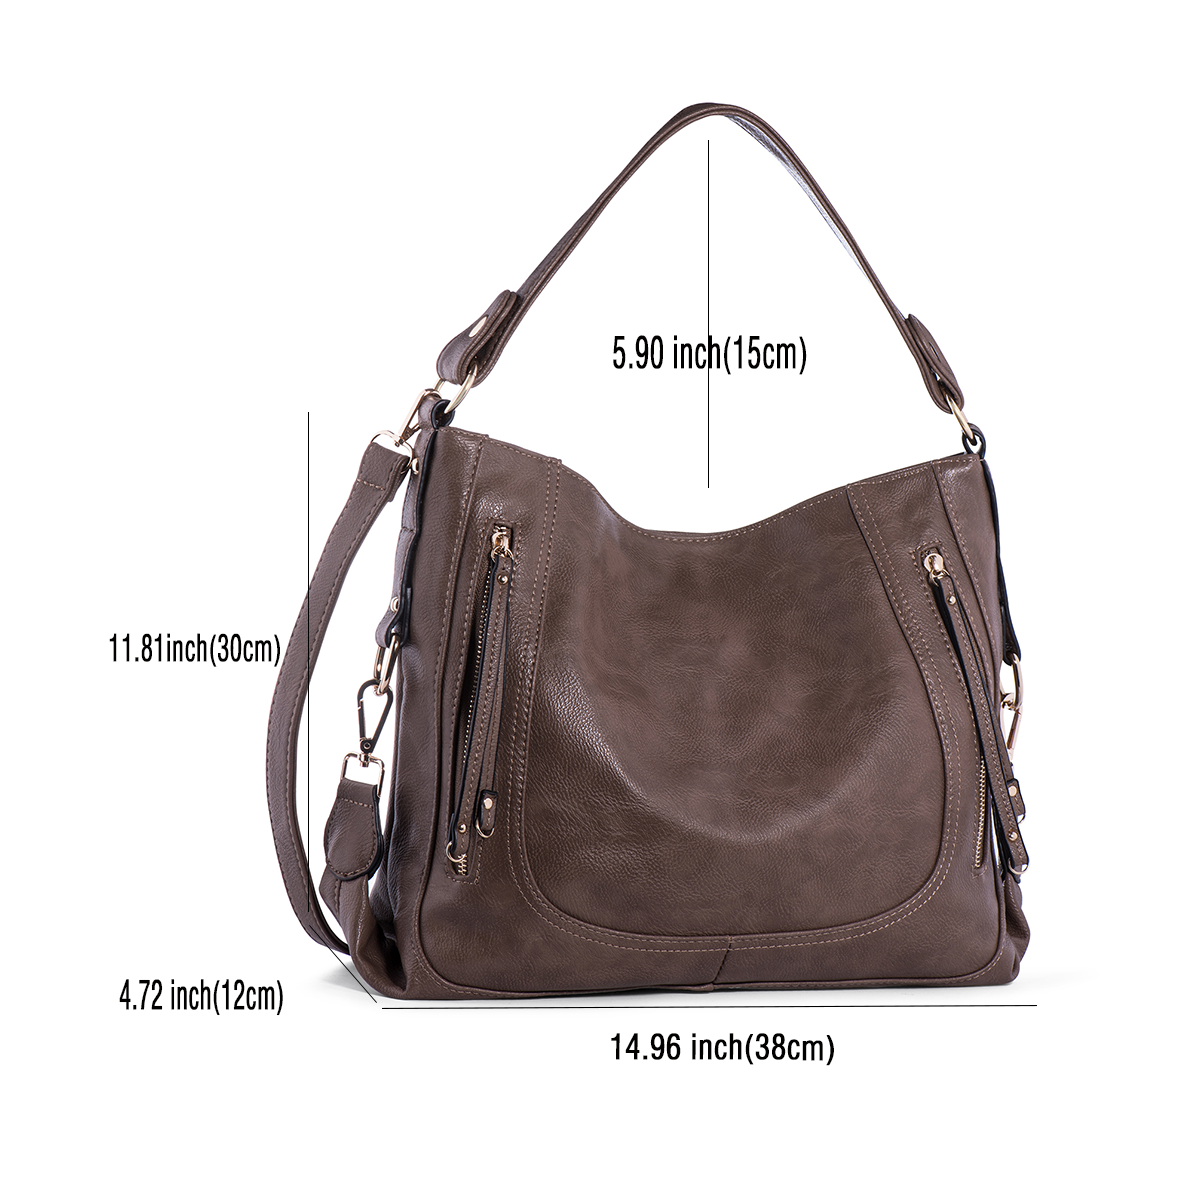 Handbags for Women,UTAKE Women's Shoulder Bags PU Leather Hobo Handbags Top-Handle Purse For Ladies Grey Brown